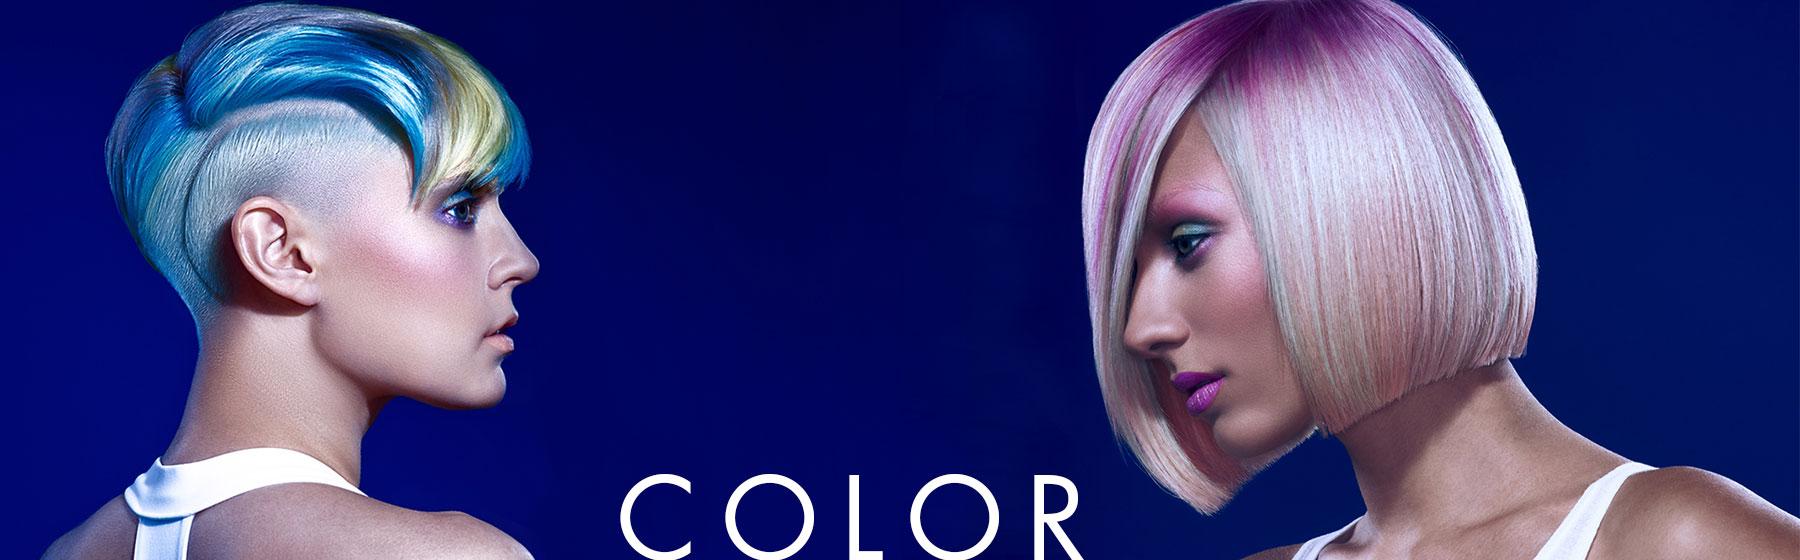 hair color services at HAUS Salon